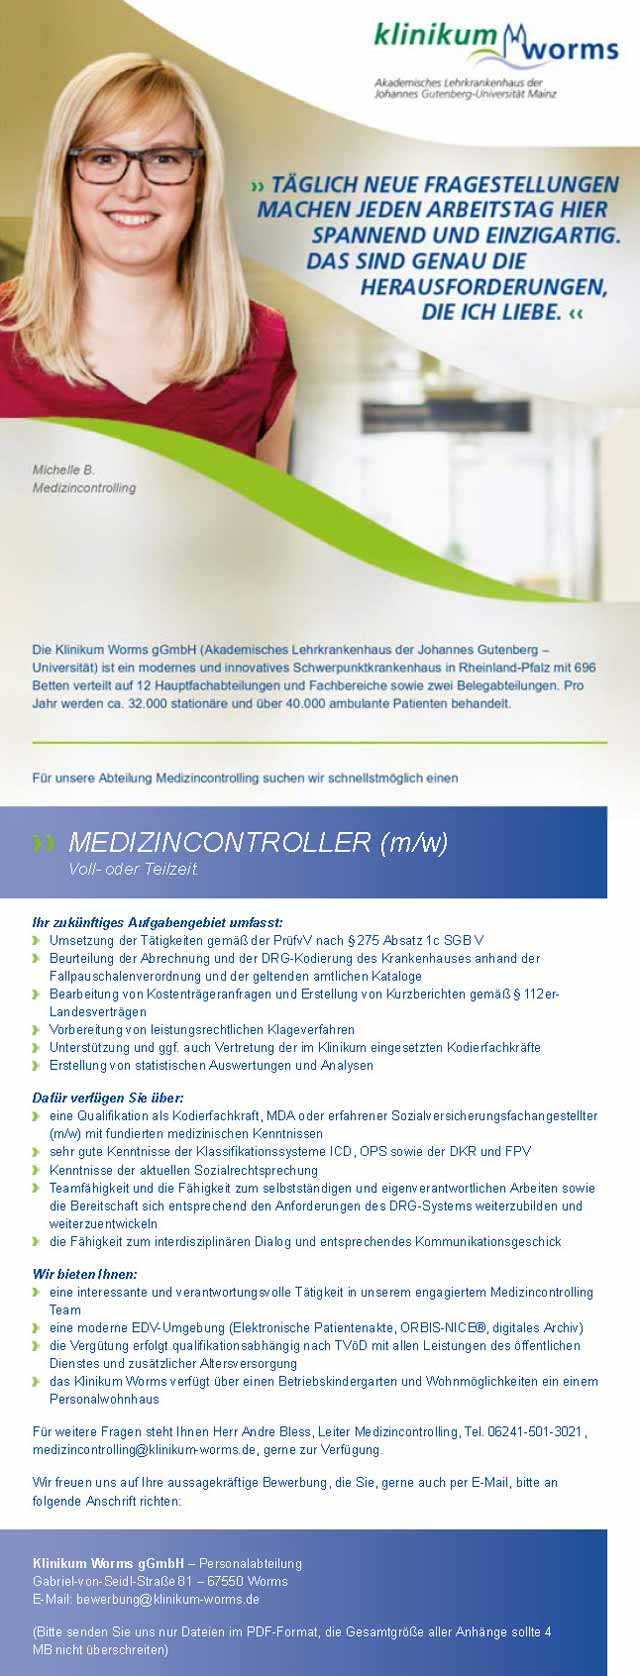 Klinikum Worms gGmbH: Medizincontroller (m/w)